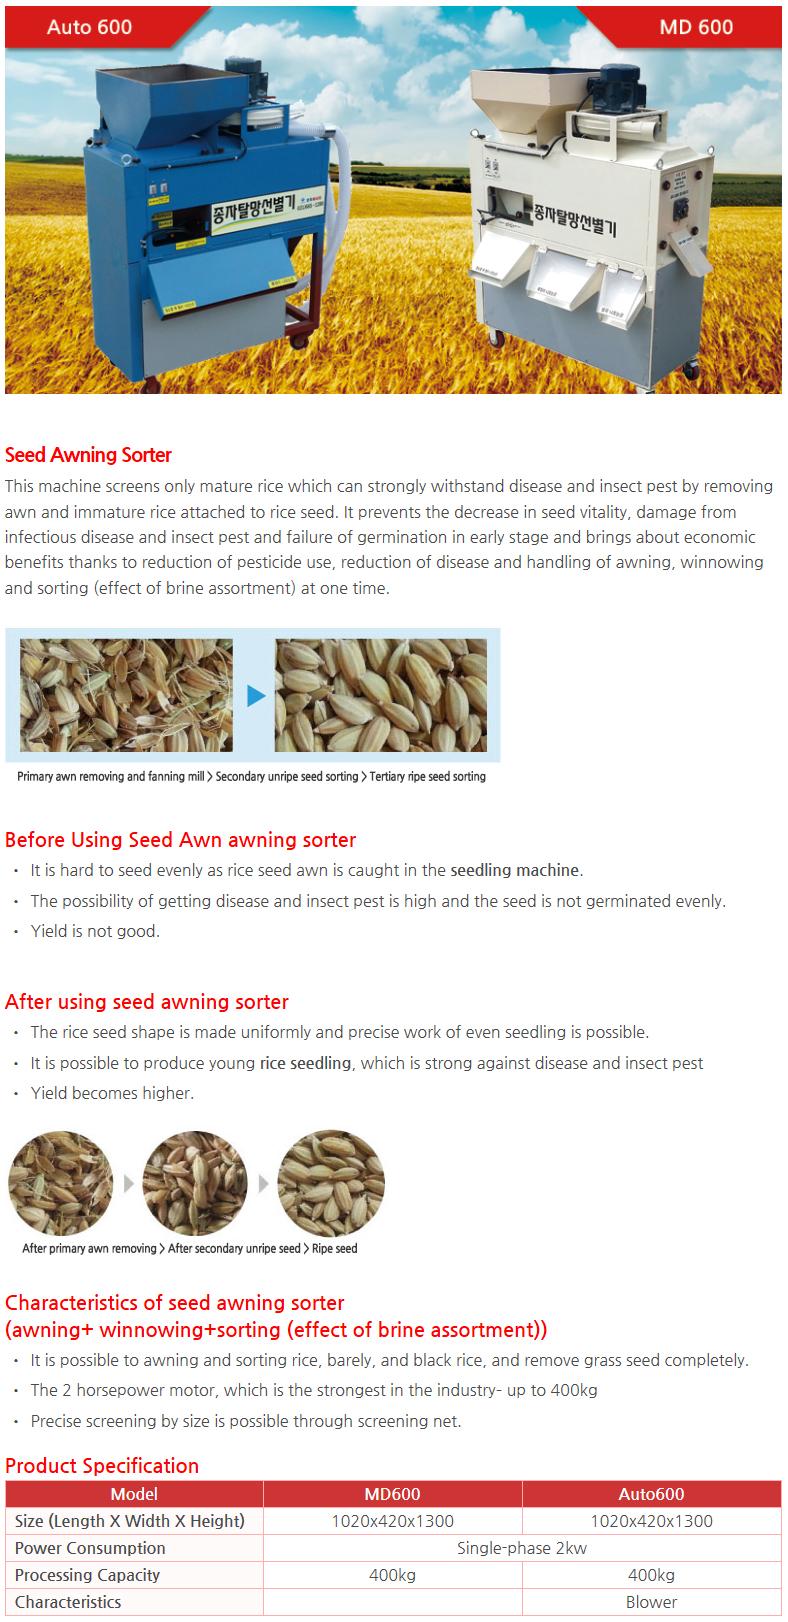 KWANG PUNG Seed Awning Sorter MD600 / Auto600